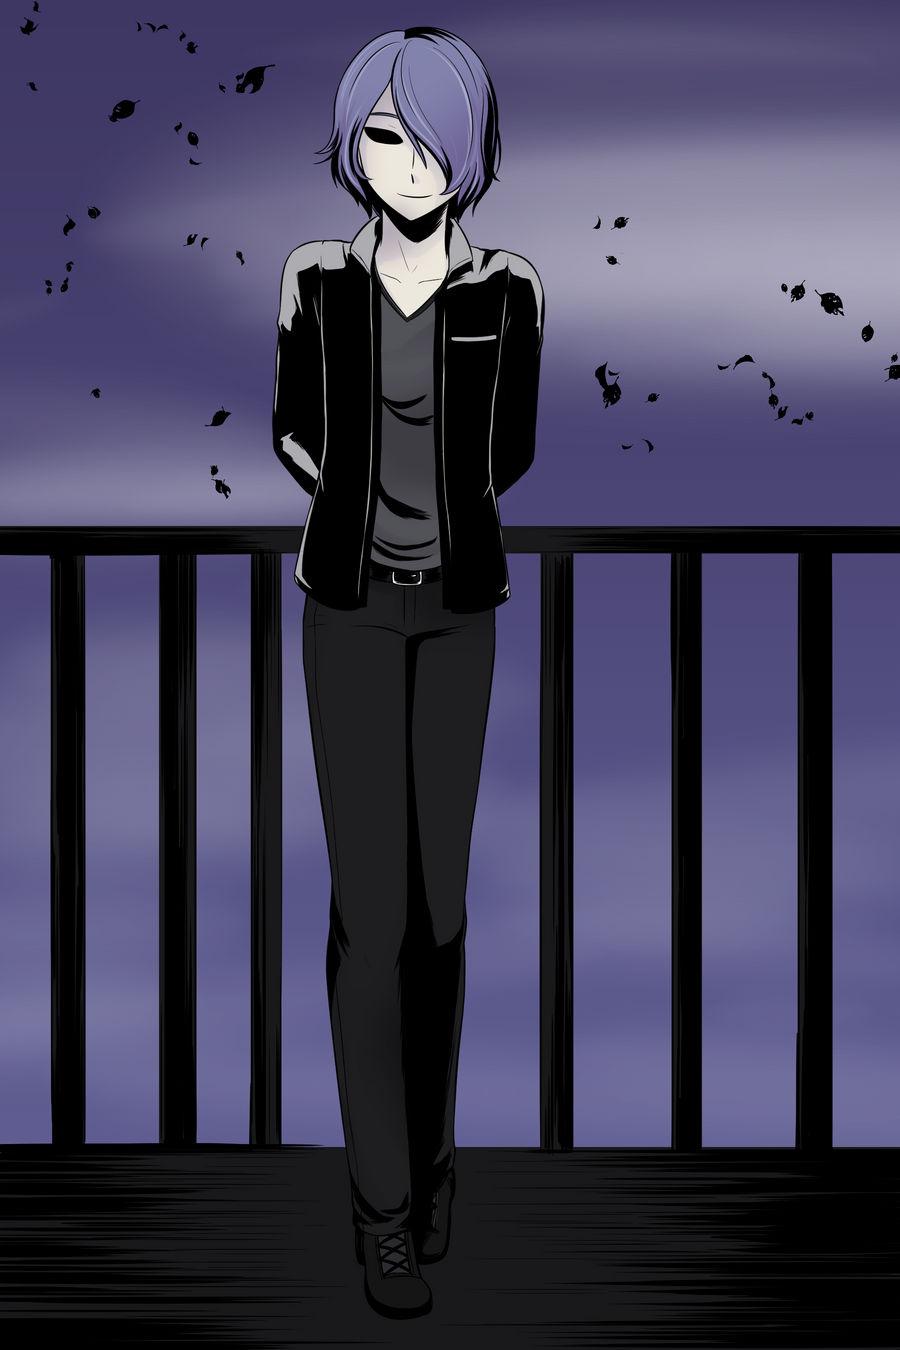 Black-eyed boy